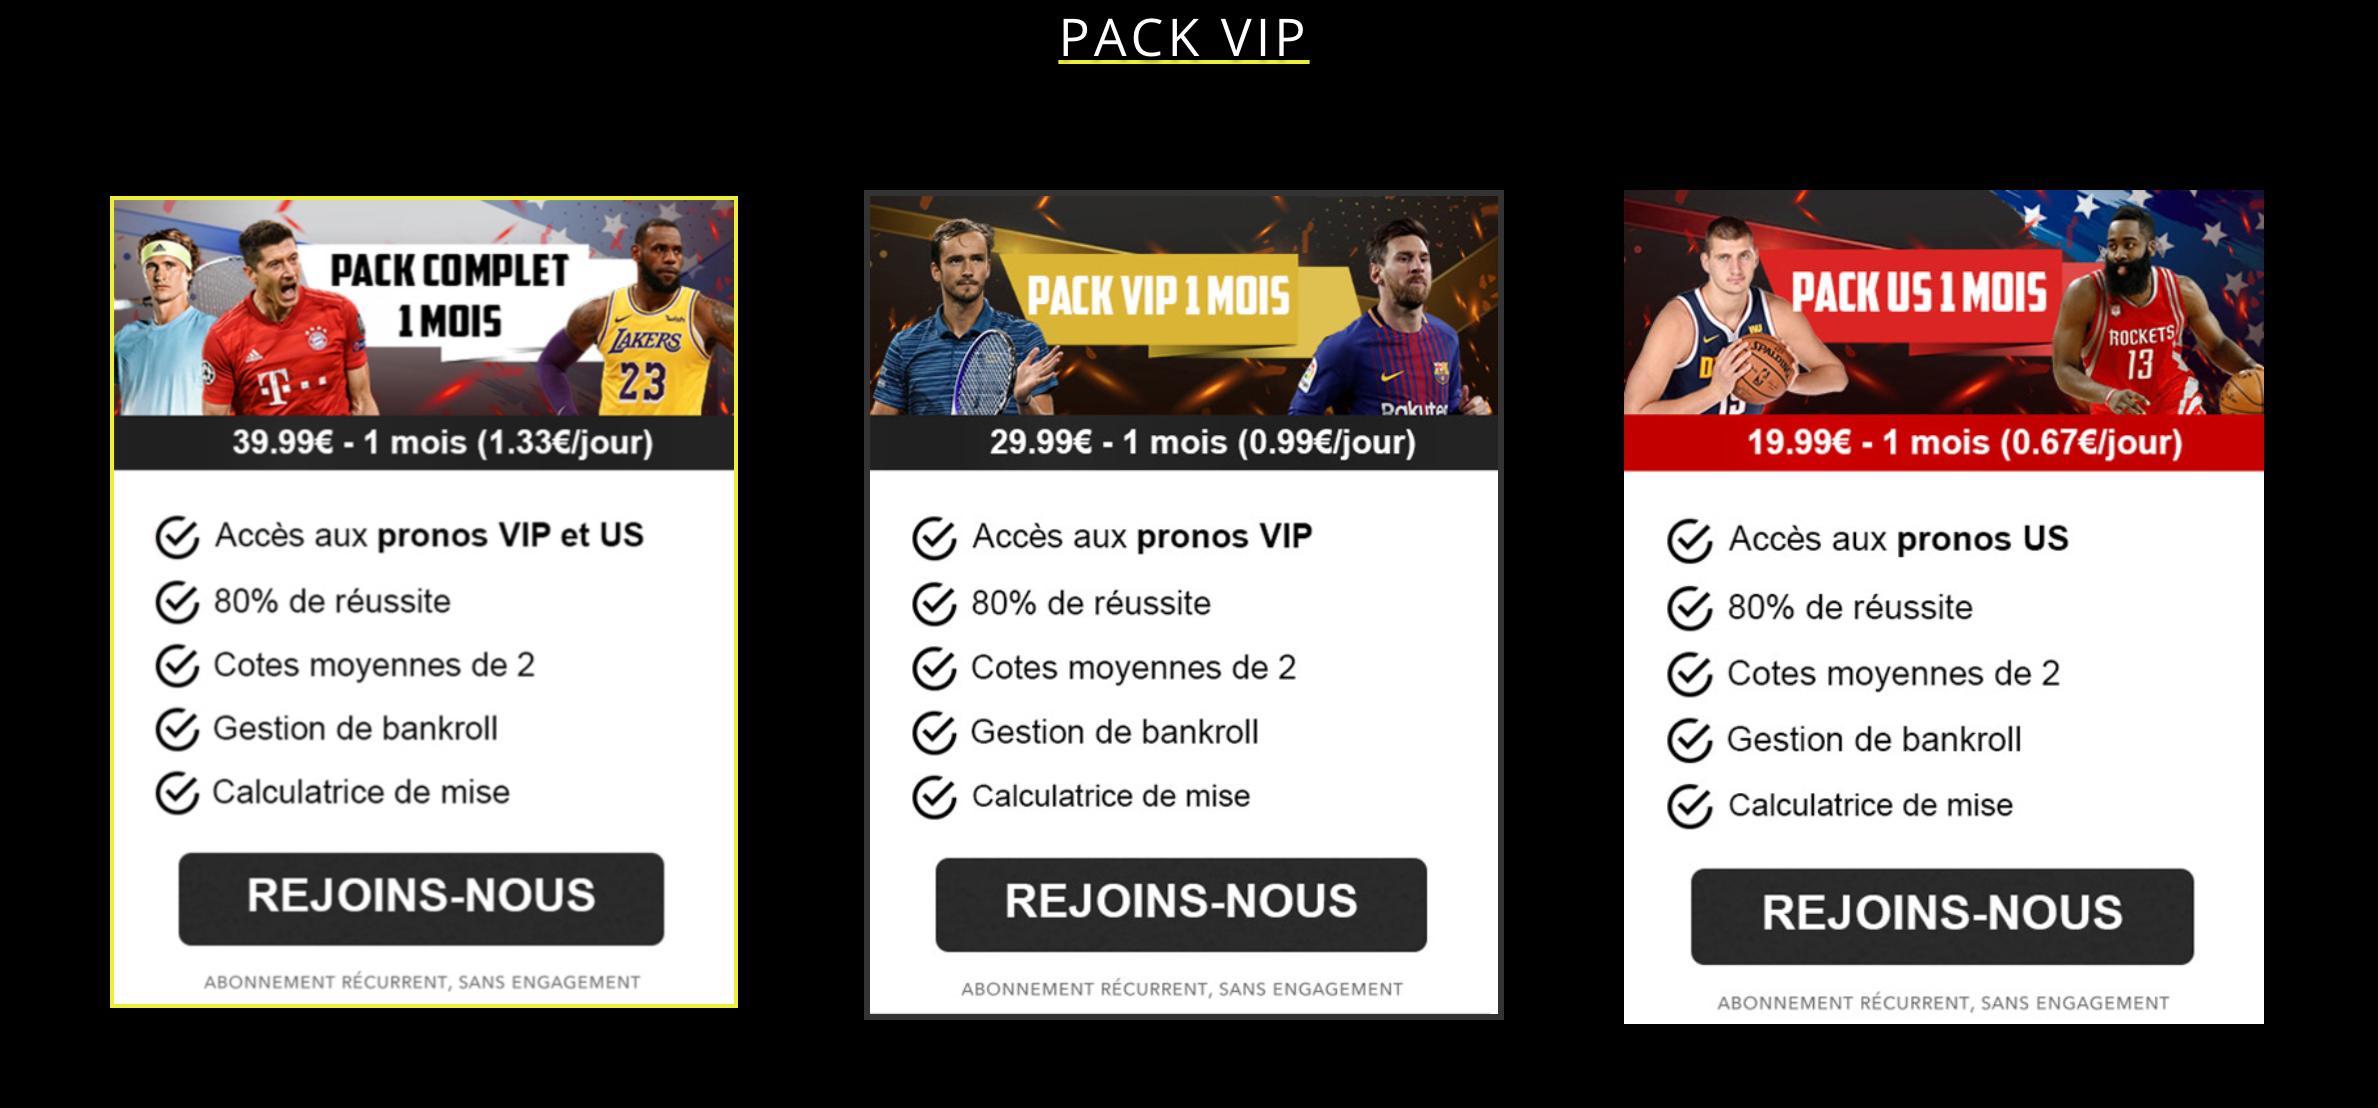 Abonnements VIP golden bet